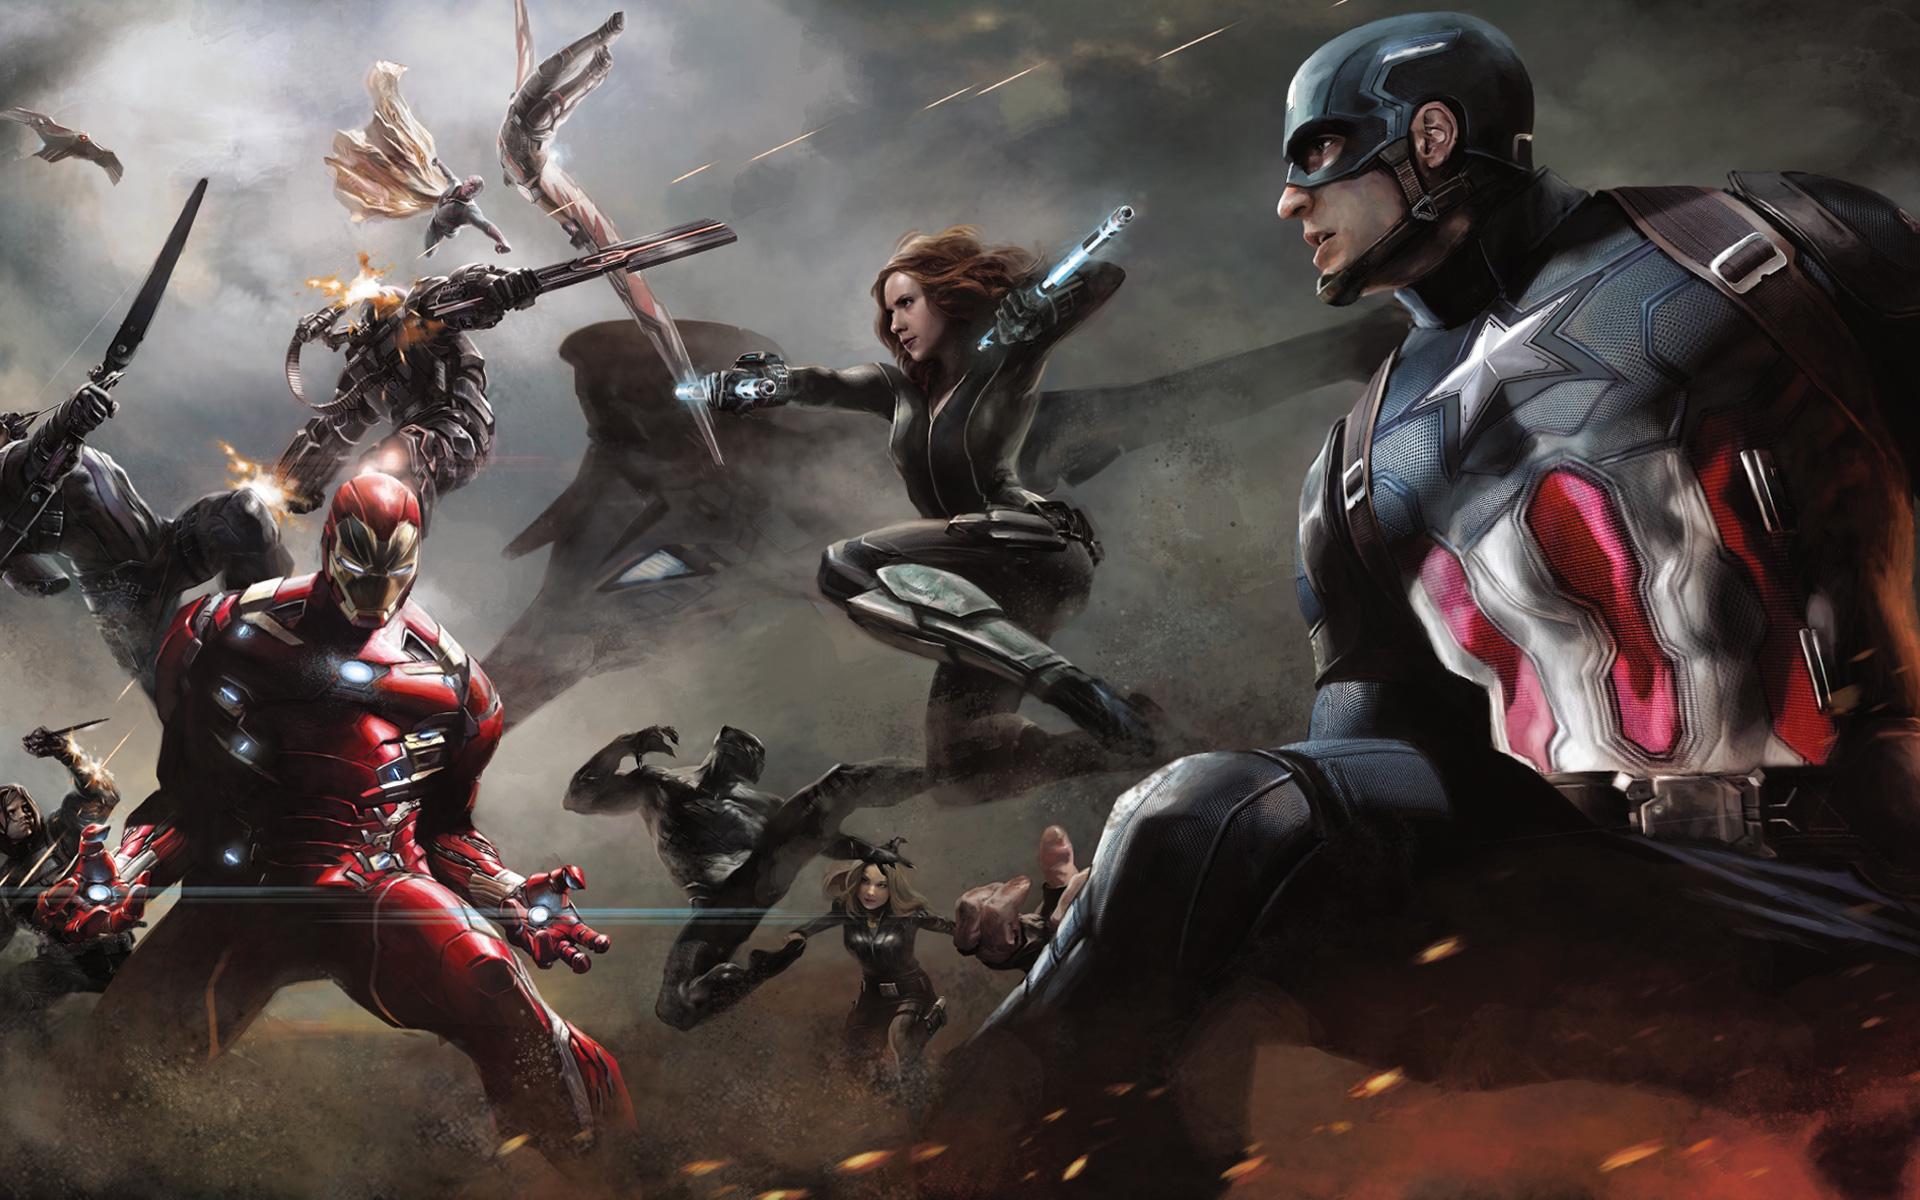 Artwork Captain America Civil War HD Wallpaper   iHD Wallpapers 1920x1200